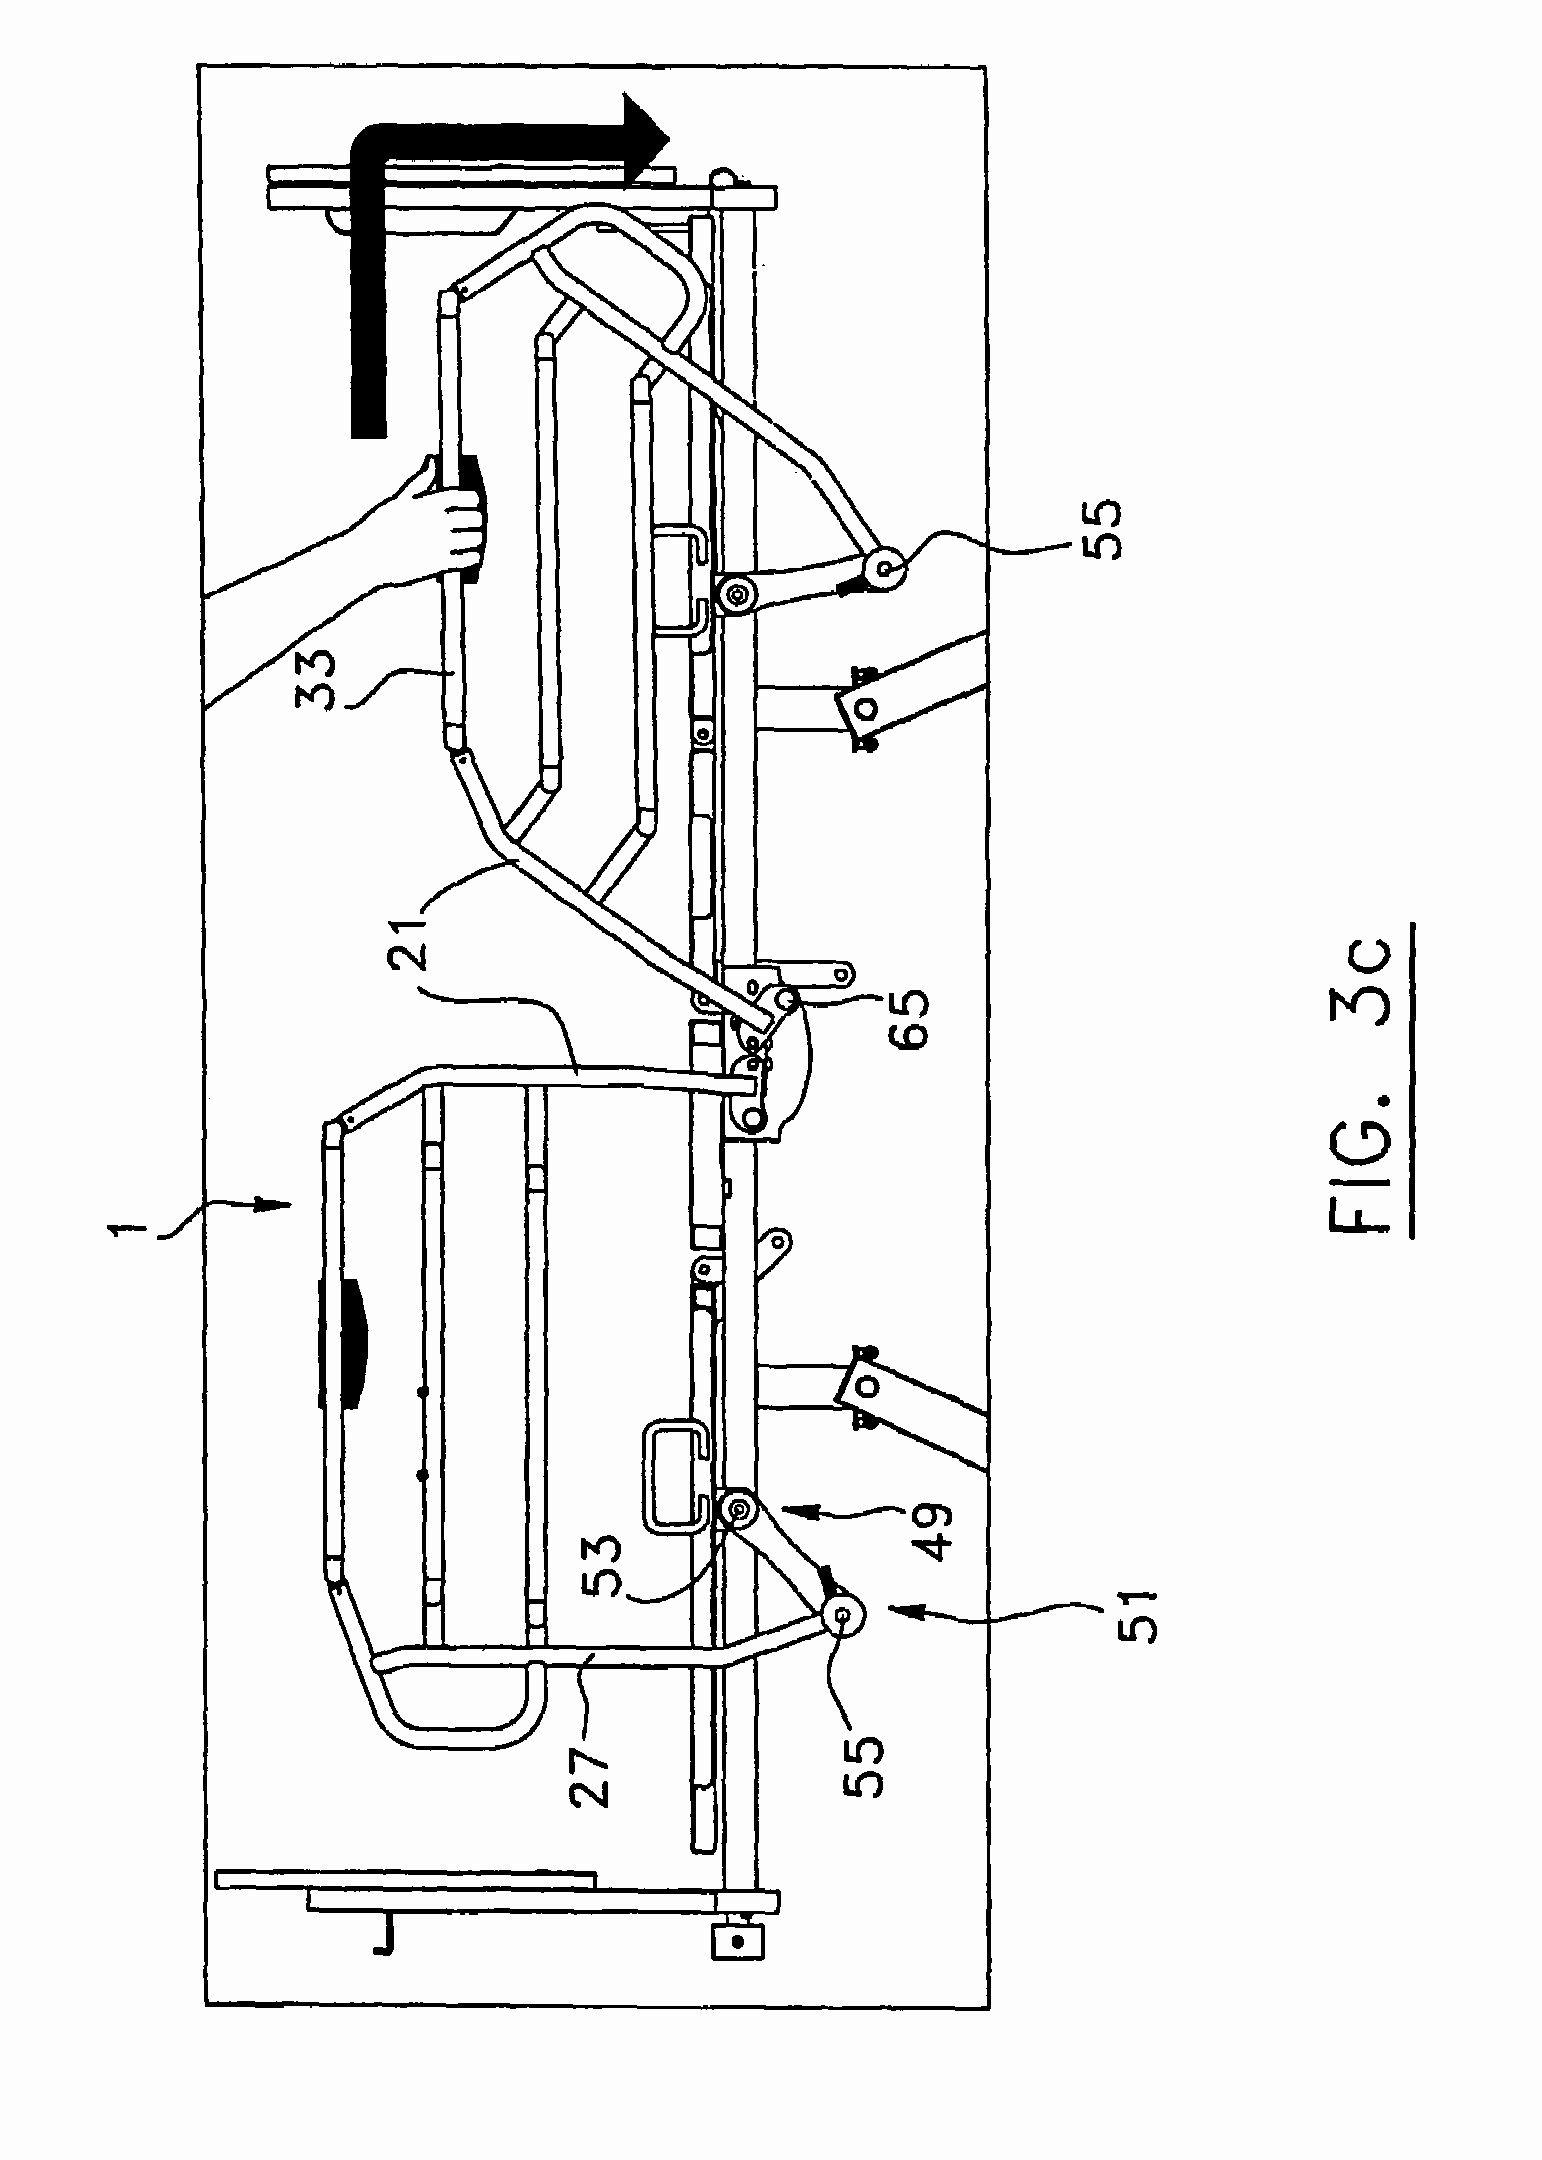 Gm Internal Regulator Alternator Wiring   Wiring Diagram - Gm Alternator Wiring Diagram Internal Regulator